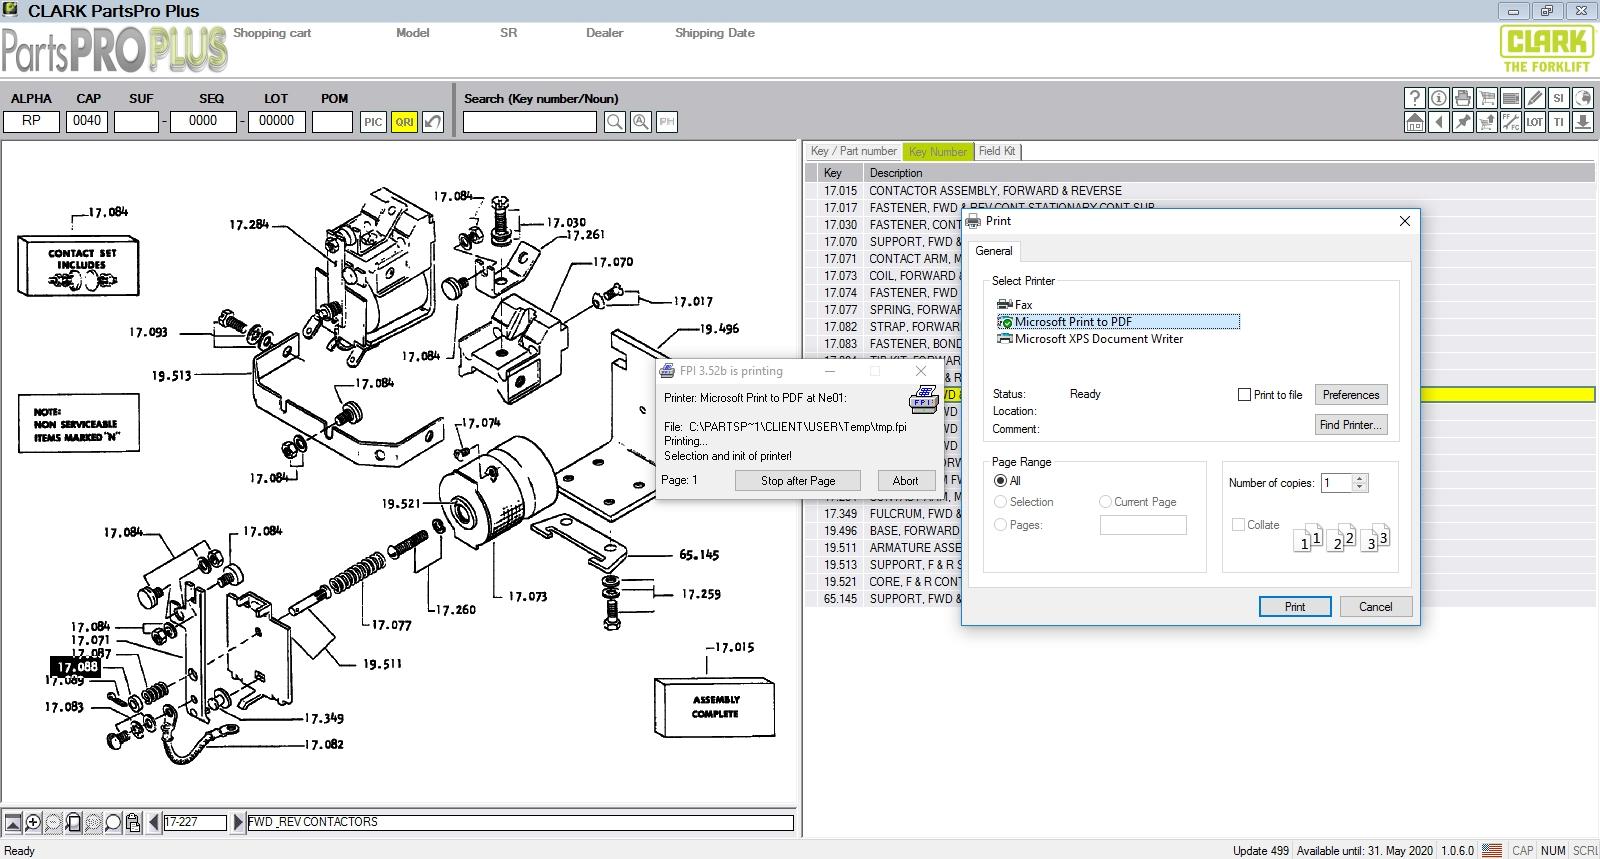 Clark Forklift Parts Pro Plus V499  03 2020